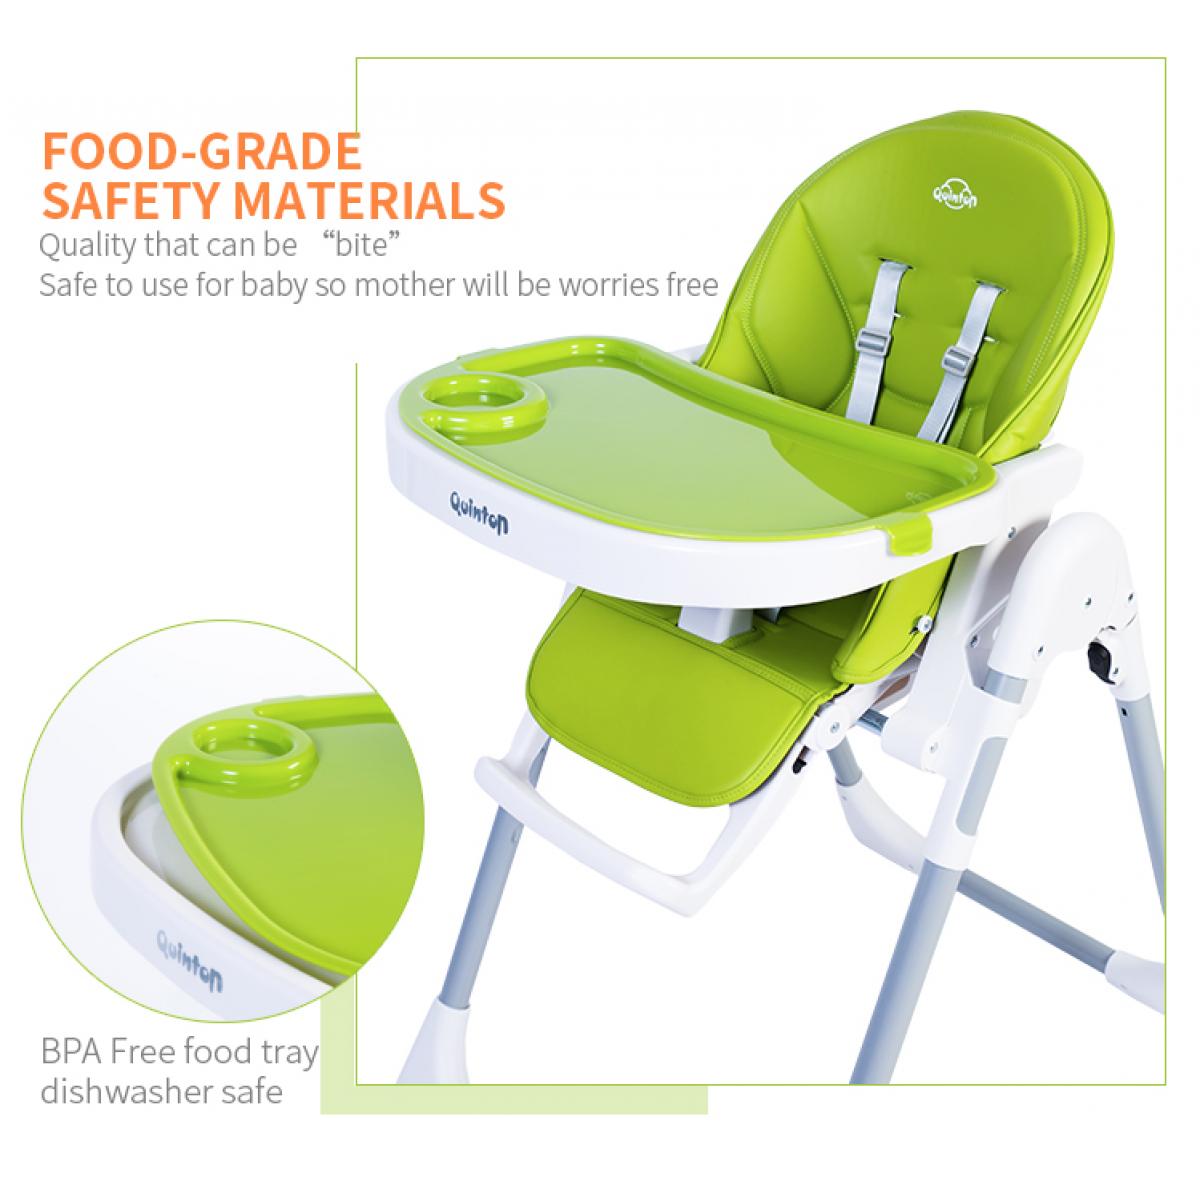 Quinton Hwugo Premium Multifunction Baby High Chair FREE CALIBOWL FREE SHIPPING